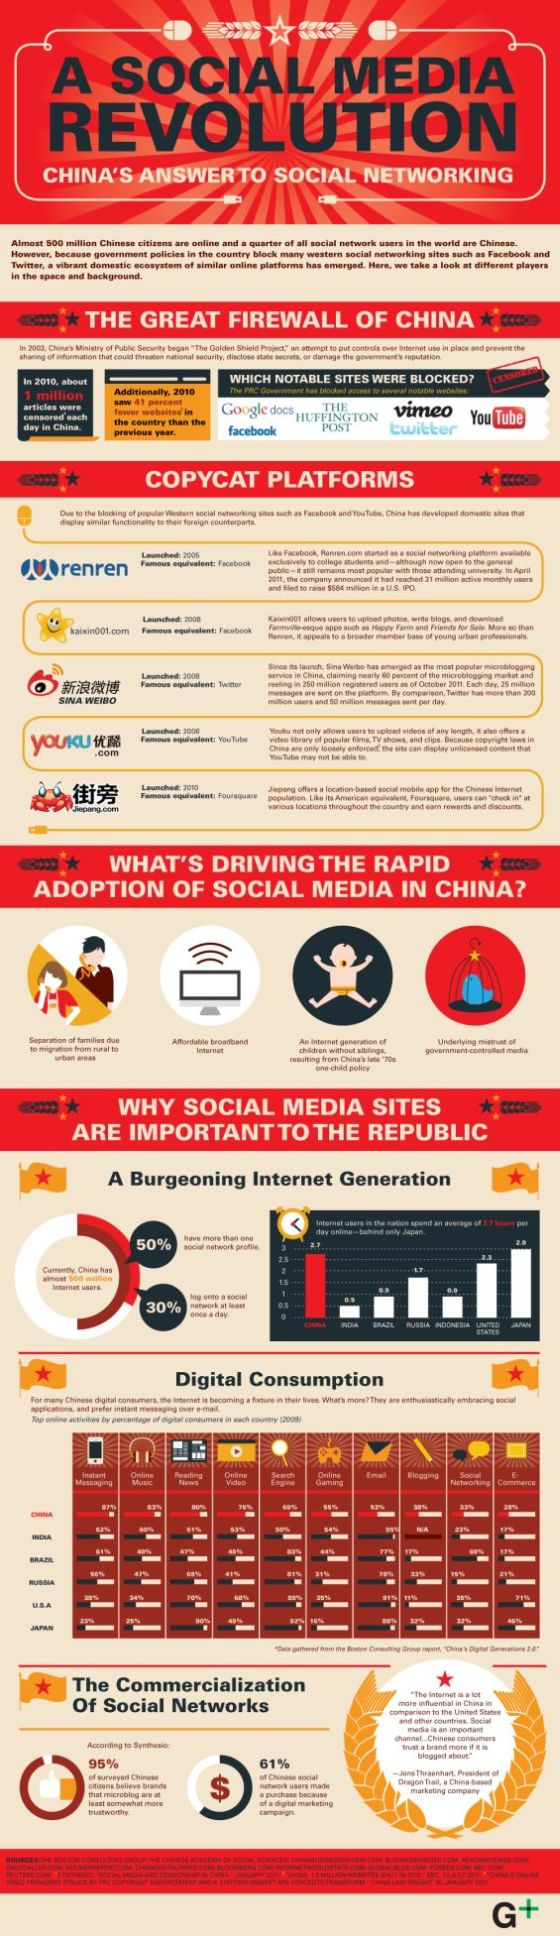 SocialMediaRevolution2